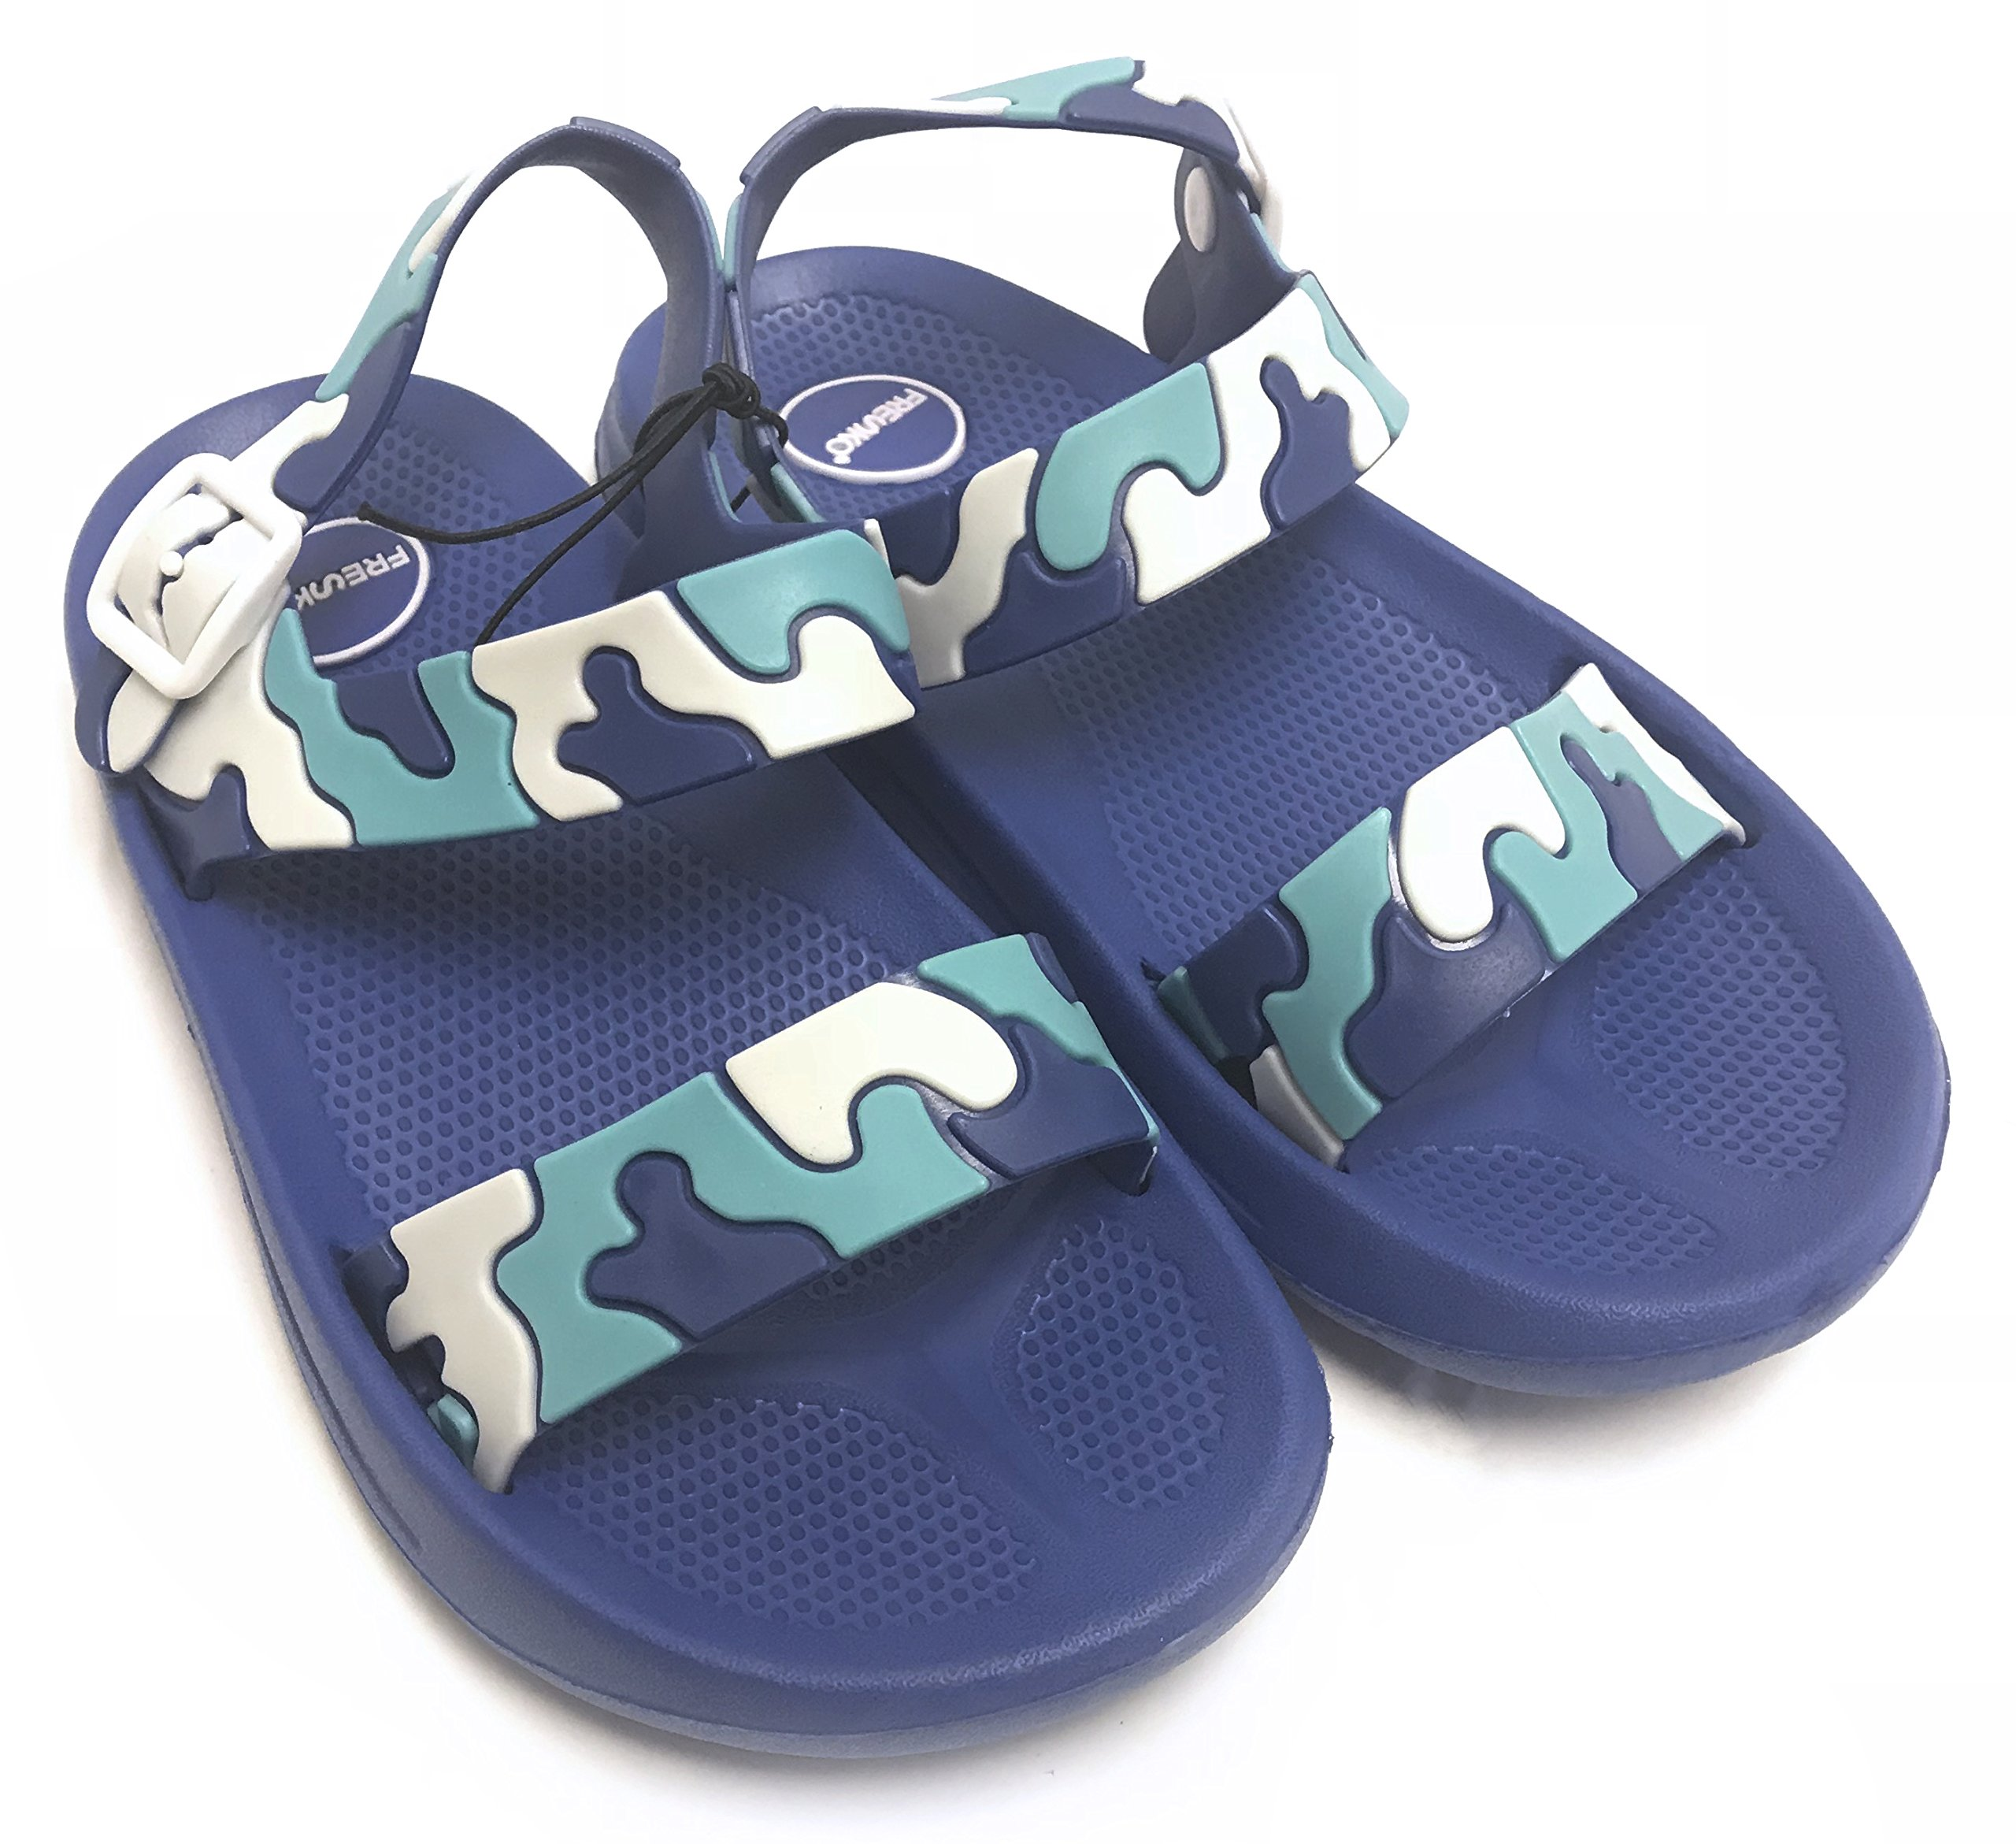 Fresko Boy's Toddler Sandals Blue Camo Size 13